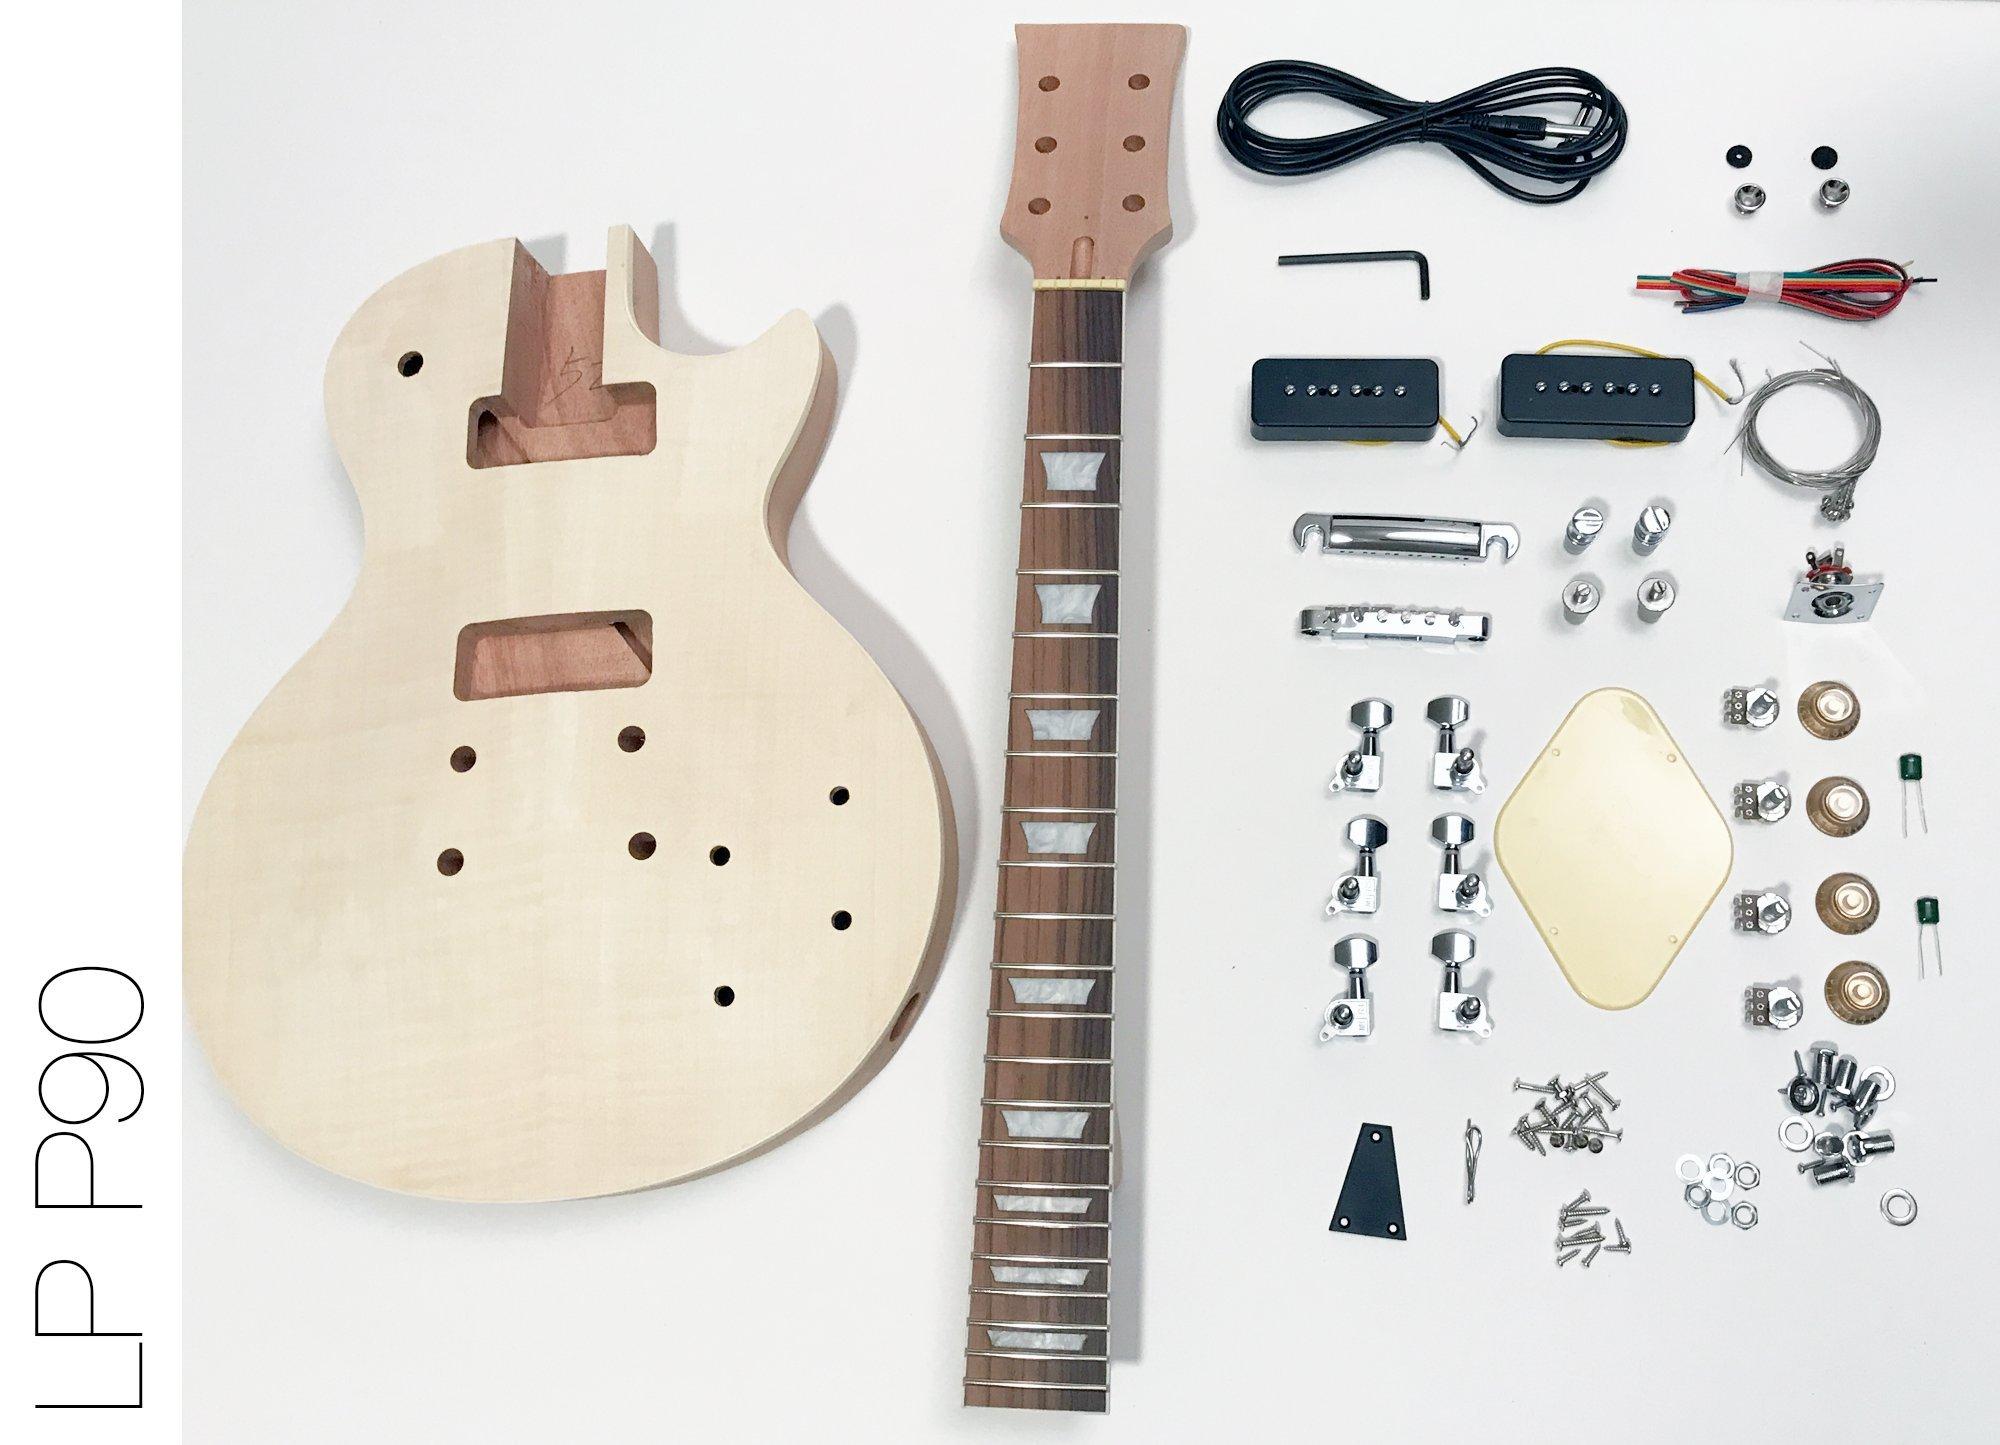 Blesiya Pack of 2 P90 Neck/&Bridge Humbucker Pickups 50//52mm Pole Spacing for LP Electric Guitar Parts Accessories